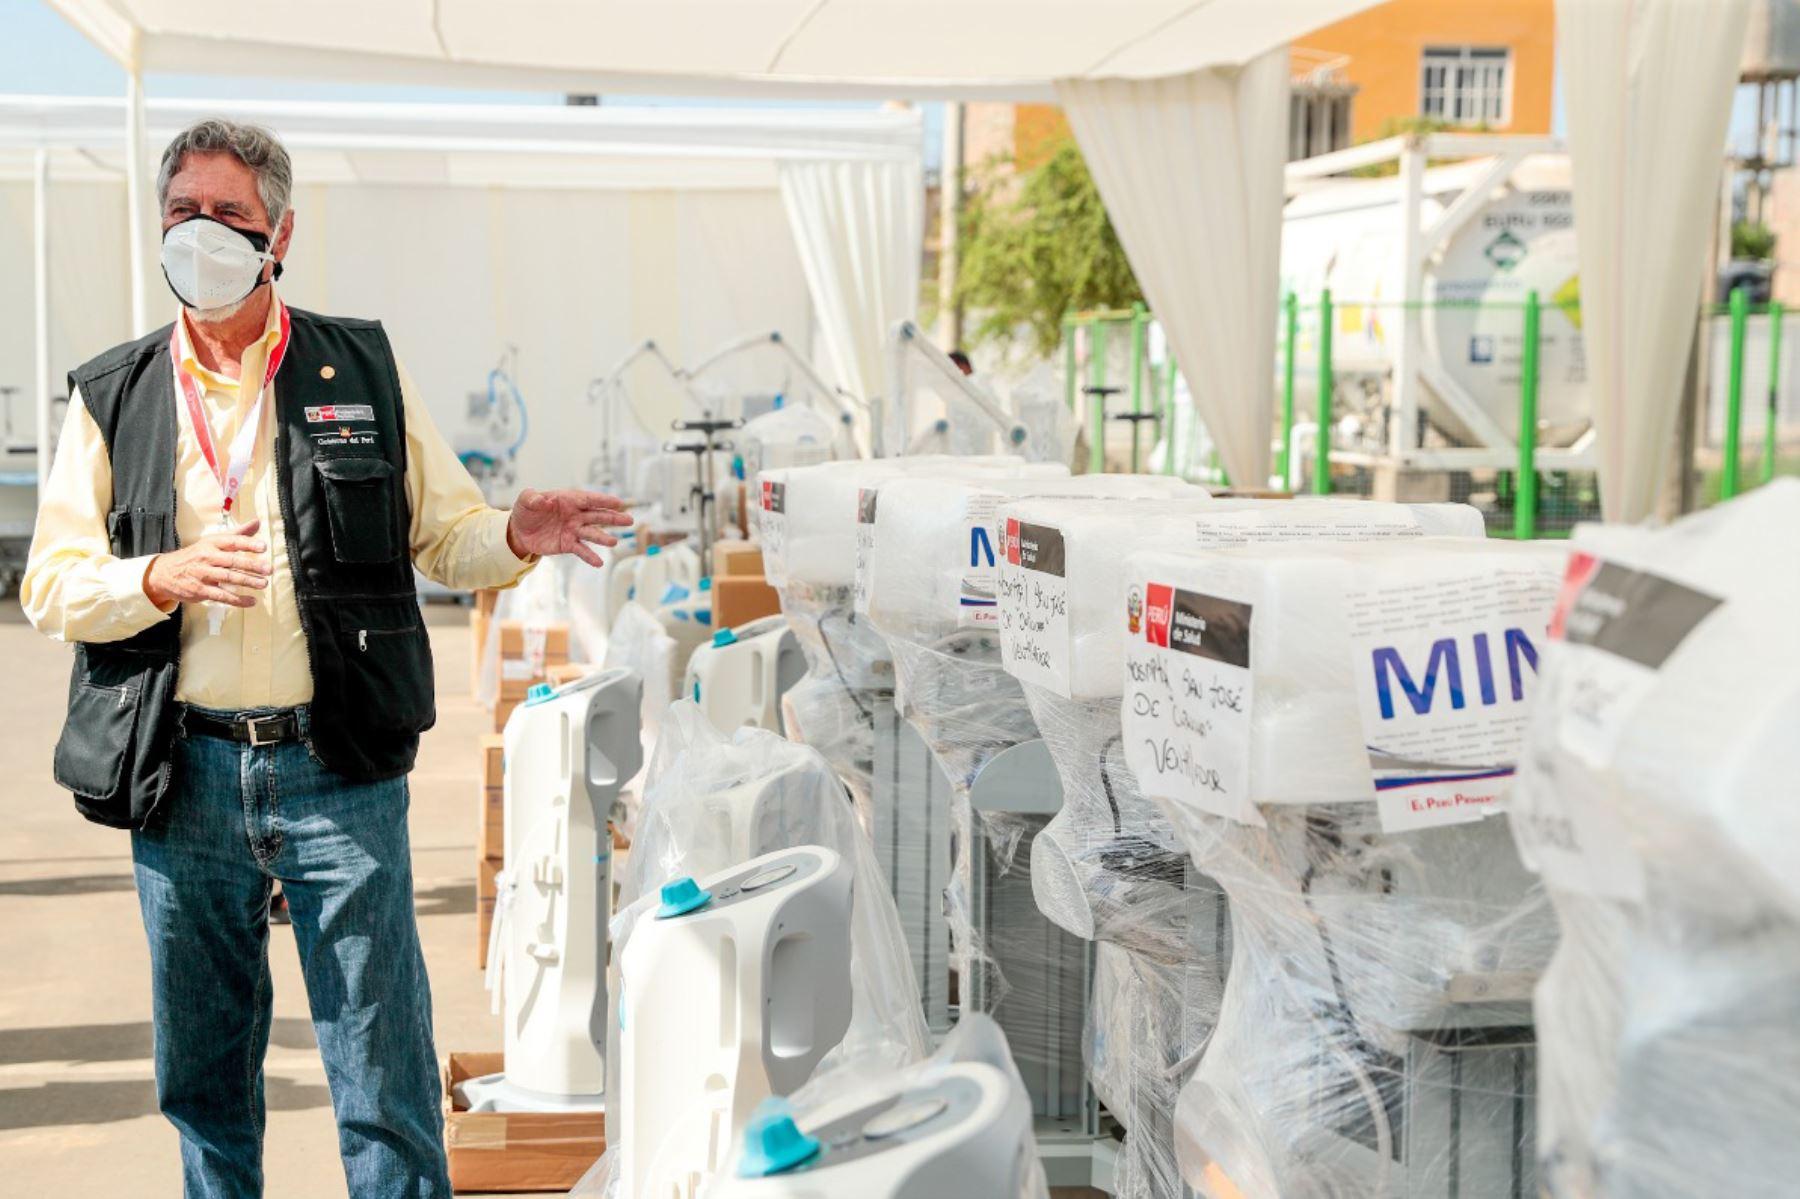 Presidente Sagasti entrega material médico a hospitales de Ica | Noticias |  Agencia Peruana de Noticias Andina